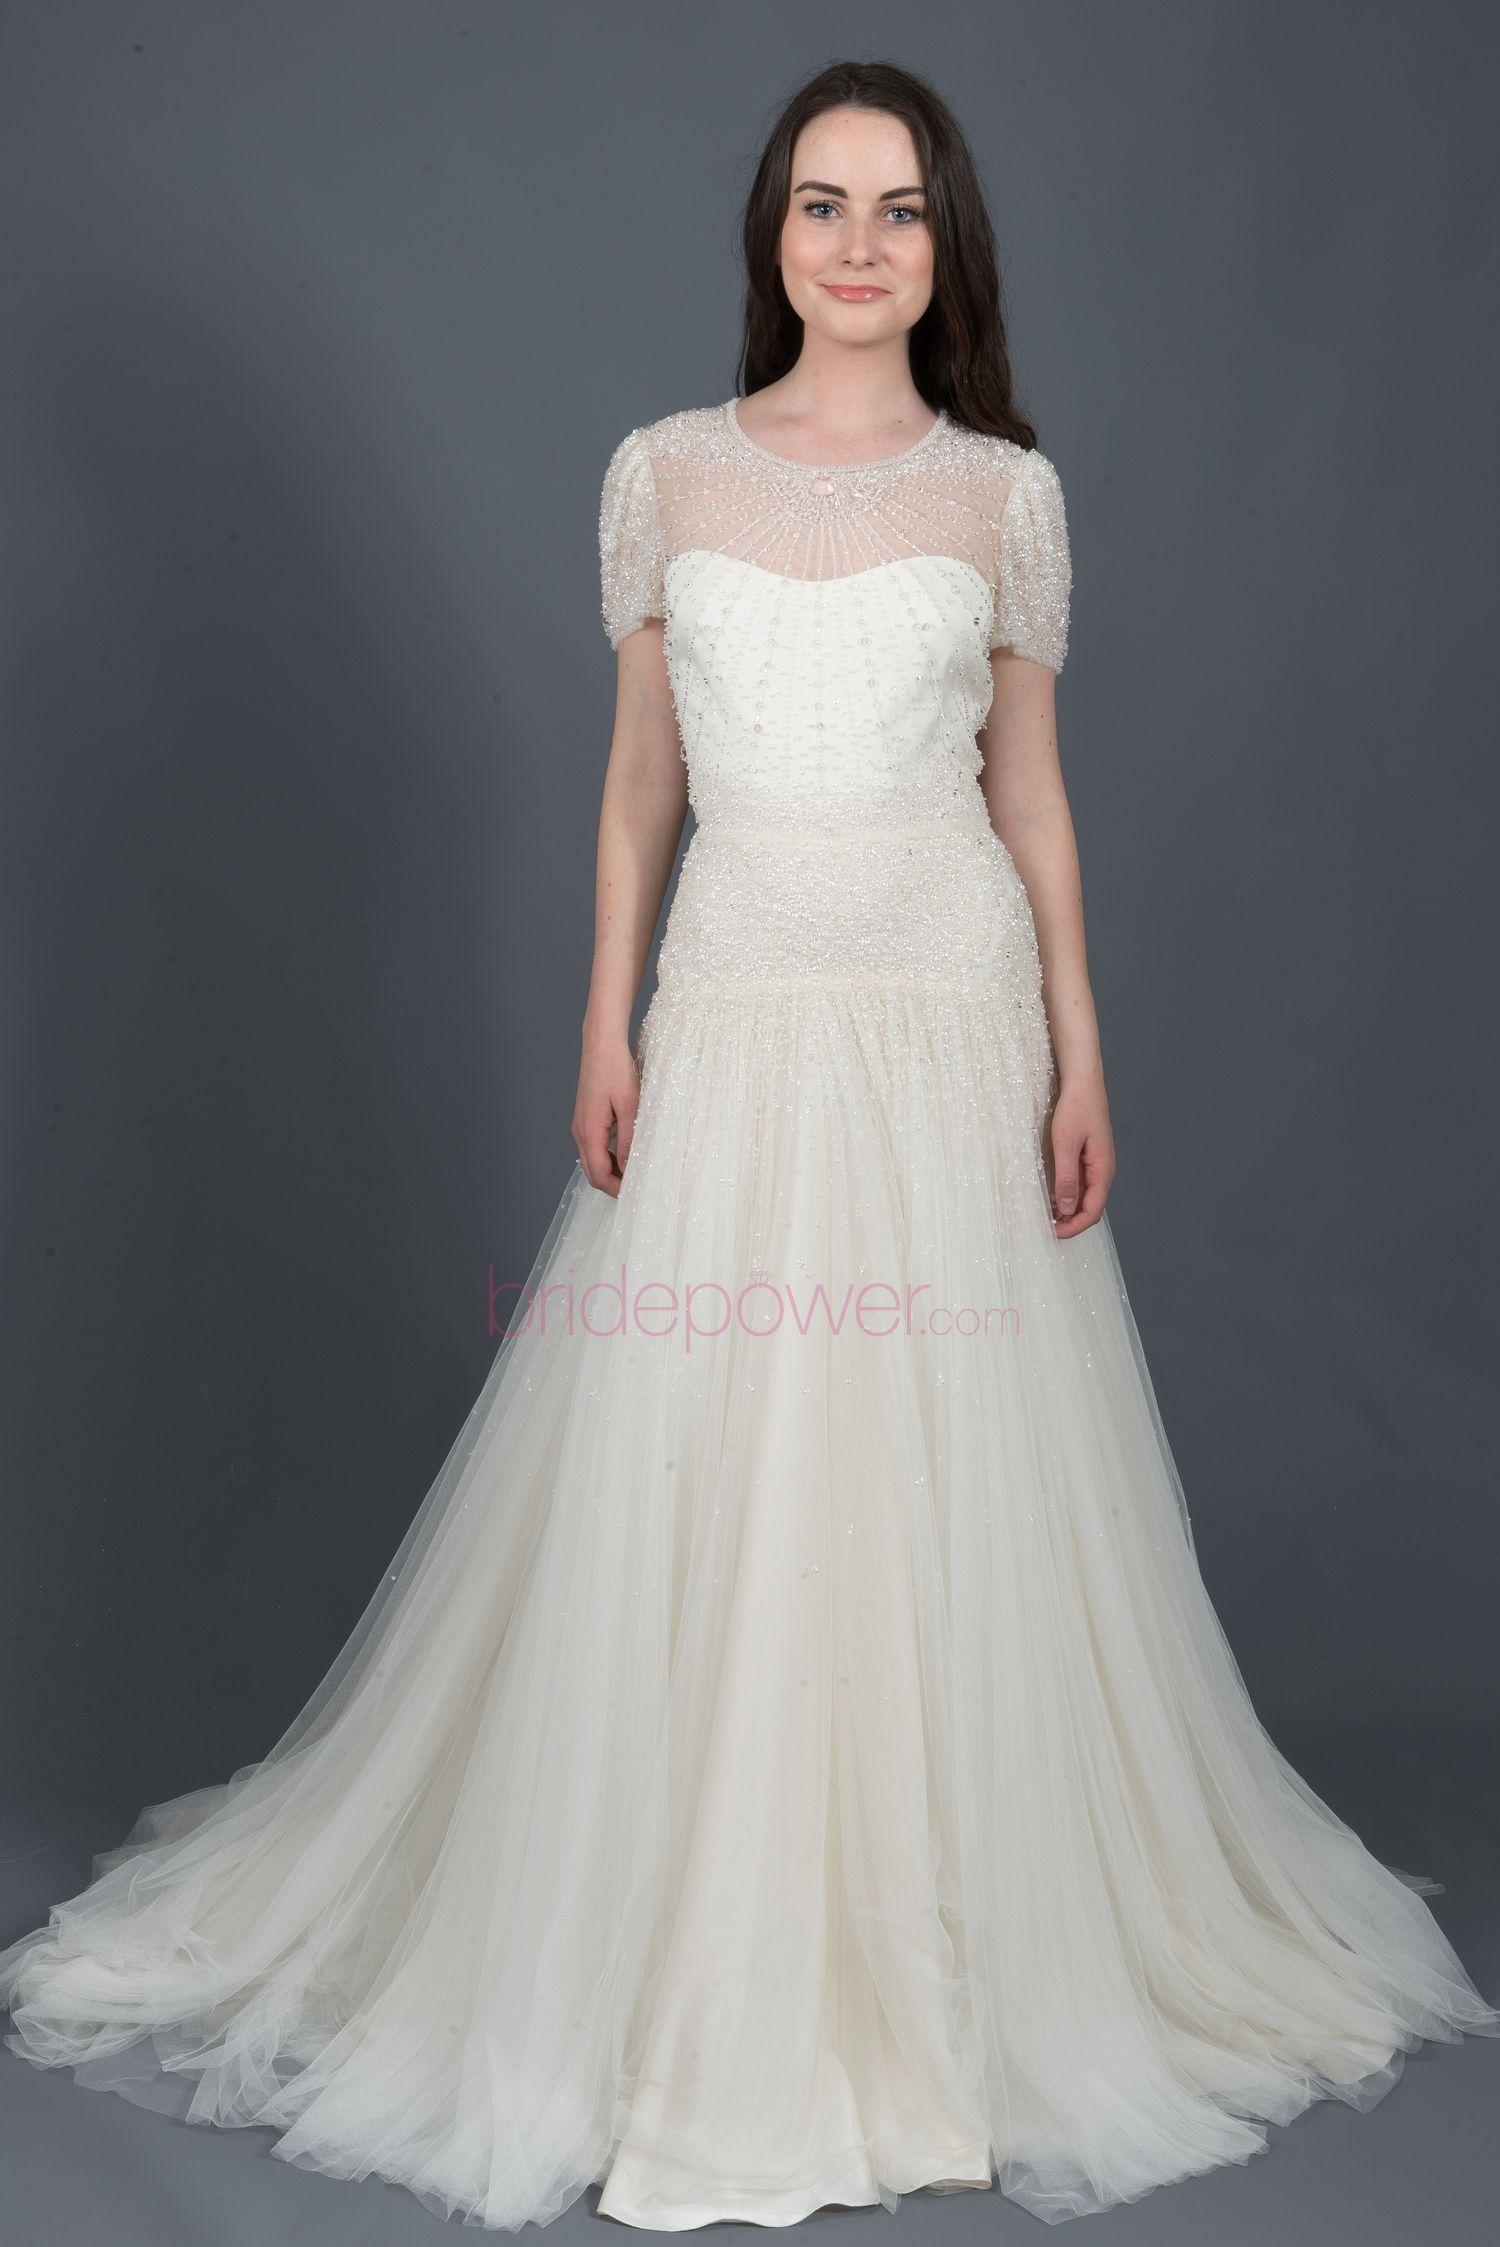 White Dress Jenny Packham Sheath 19910 Https Bride Product